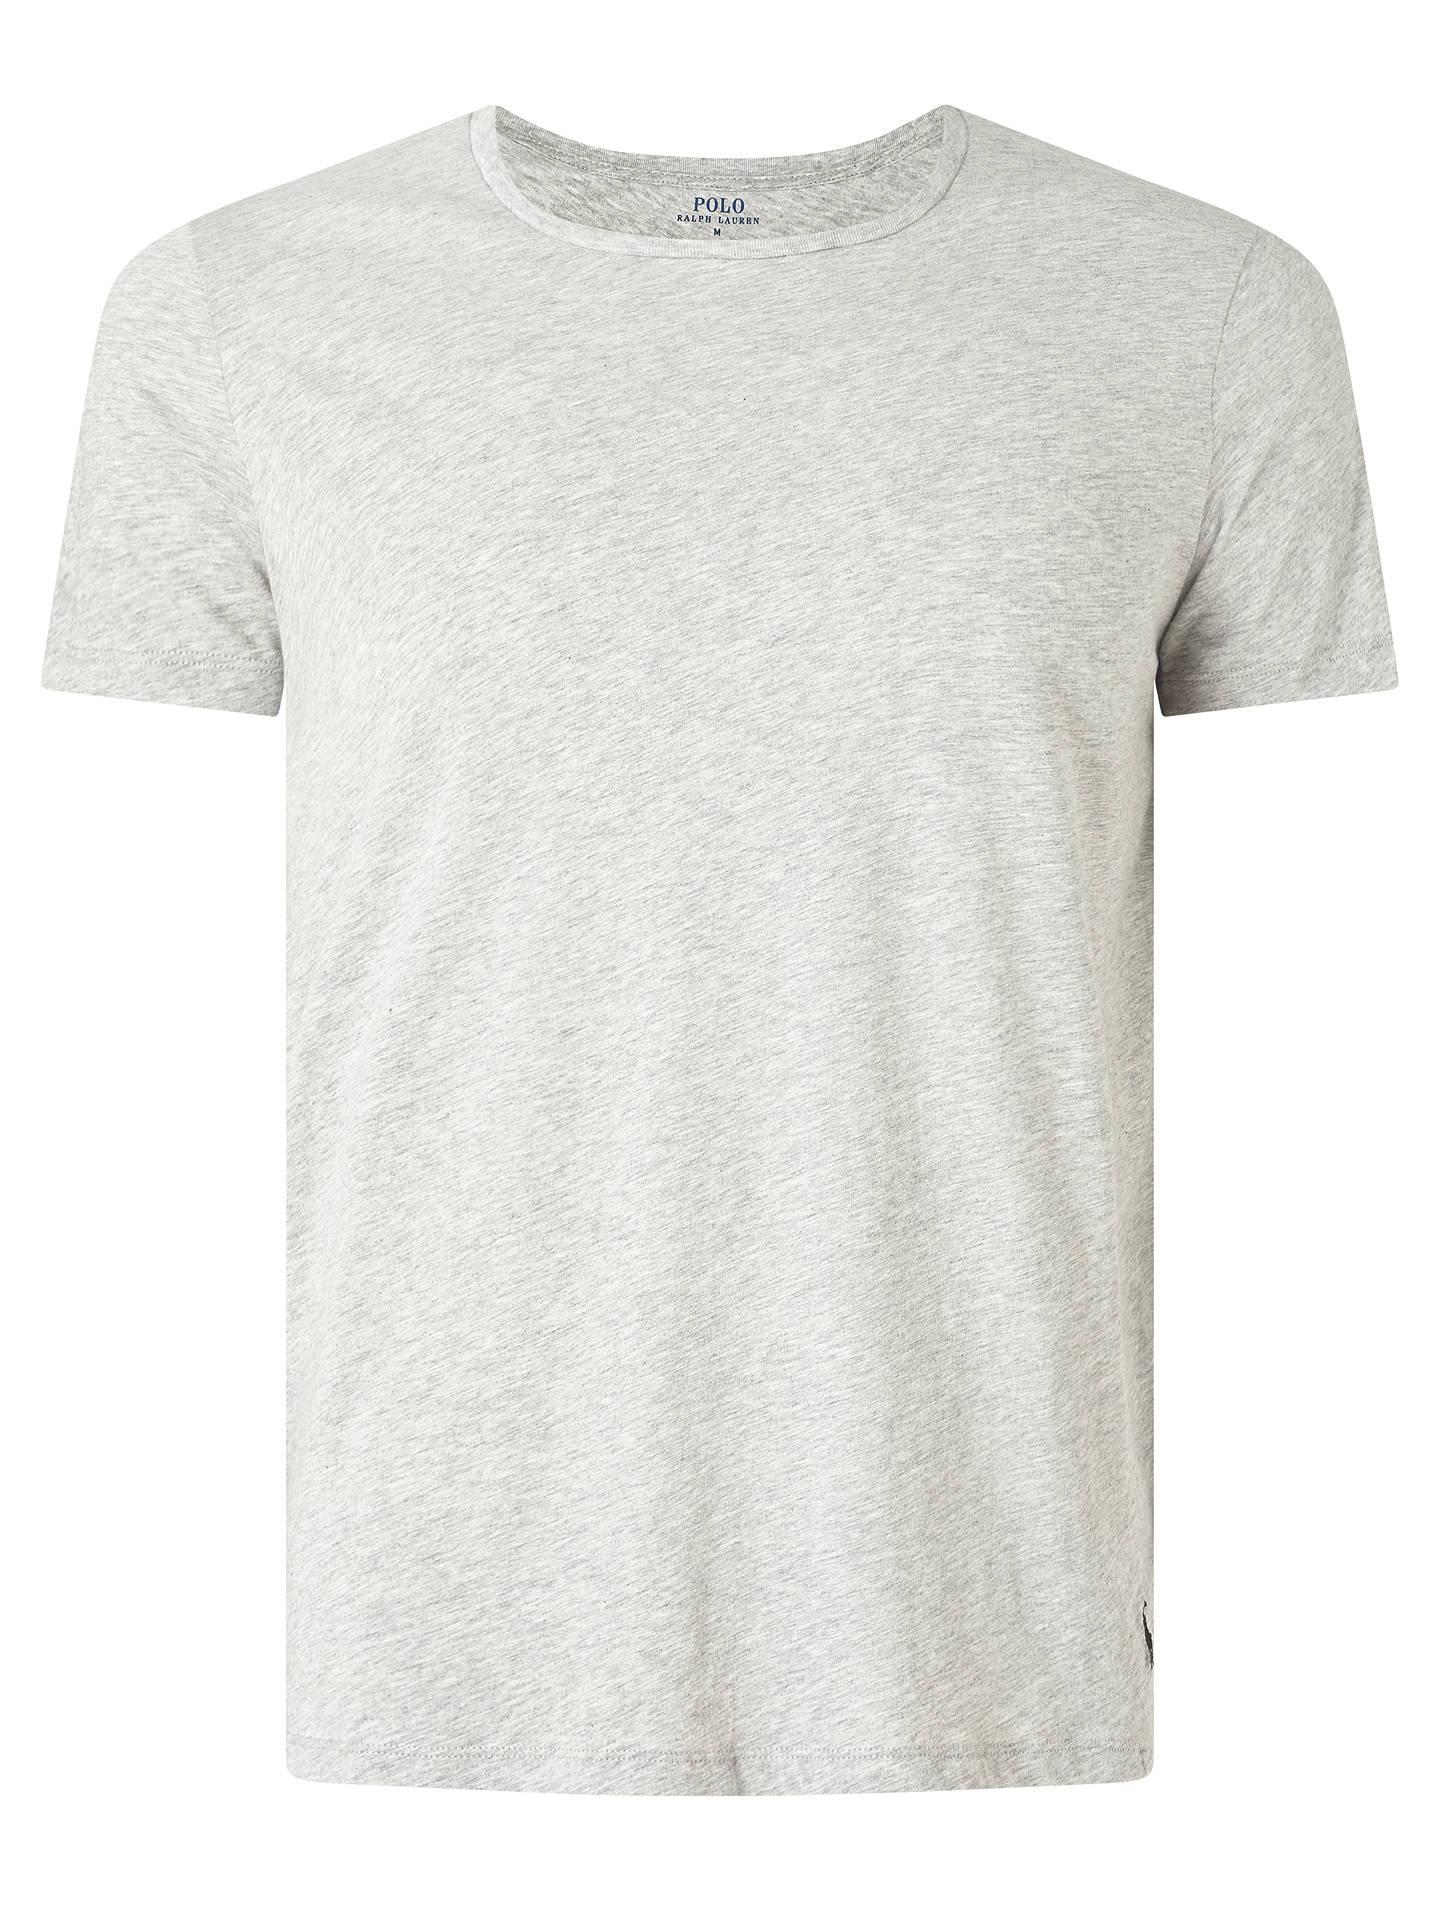 33e56a7f2e ... Buy Polo Ralph Lauren Wide Crew Neck Lounge T-Shirt, Grey, S Online